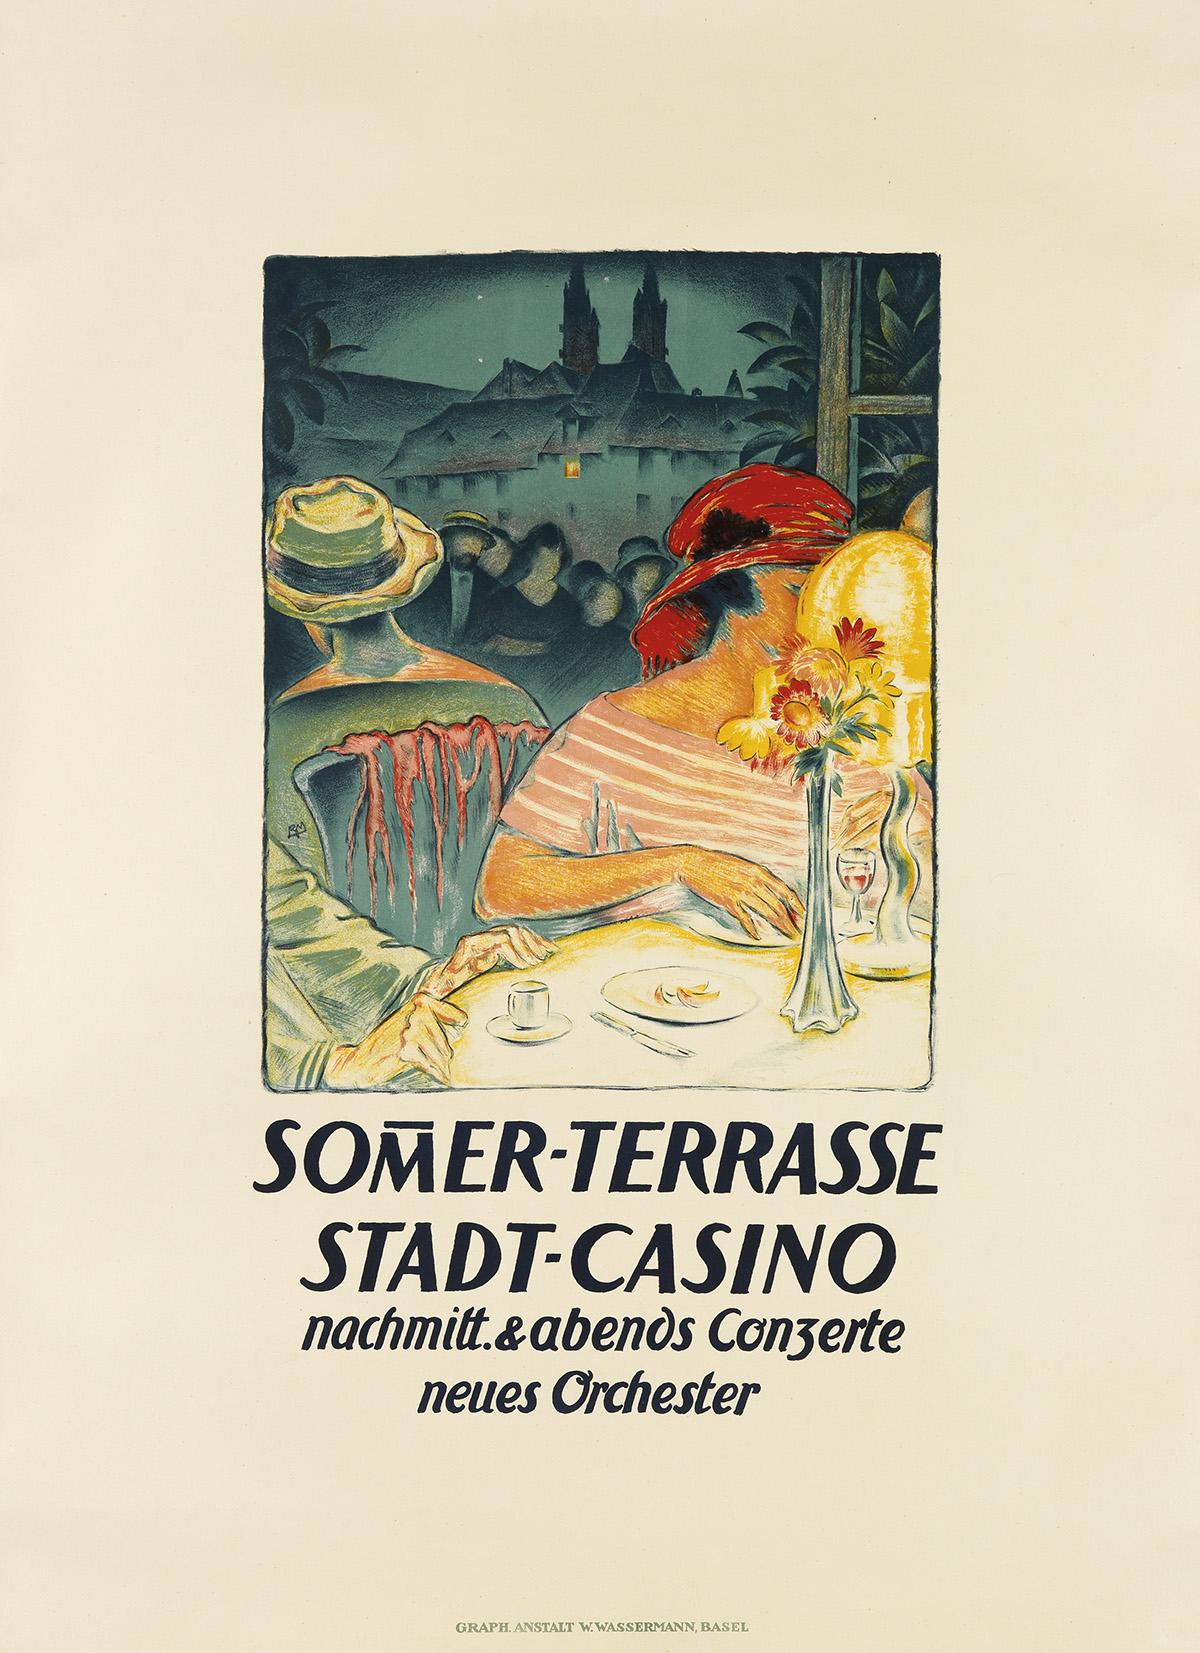 BURKHARD-MANGOLD-(1873-1950)-SOMER---TERRASSE-STADT---CASINO